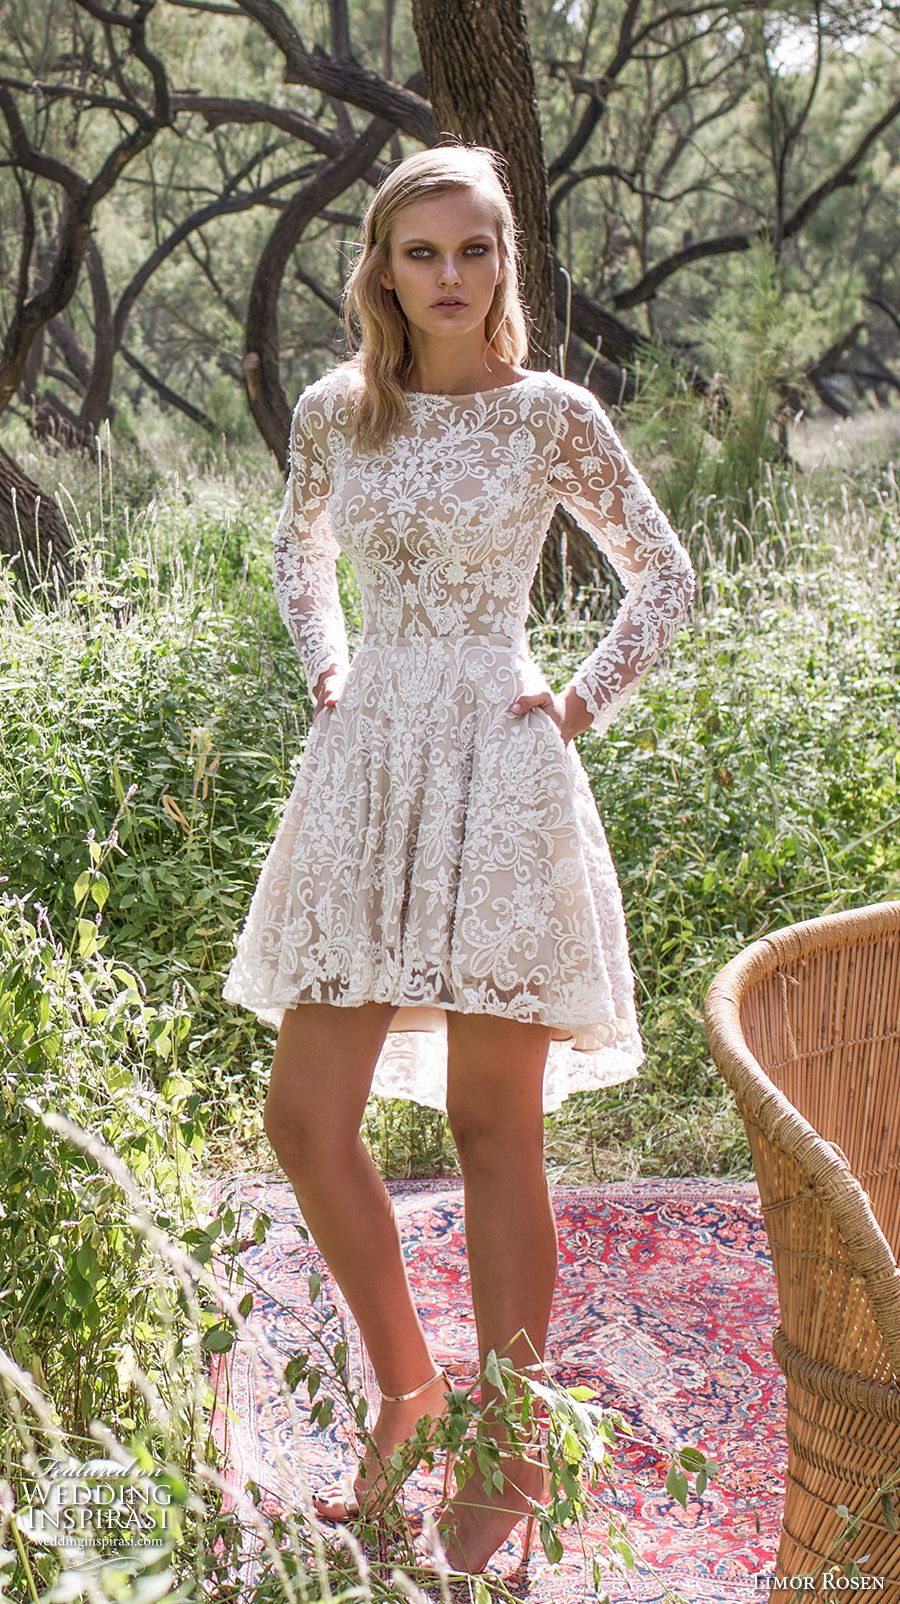 Tea length sleeve wedding dress  Limor Rosen  Wedding Dresses u ucBirds Of Paradiseud Bridal